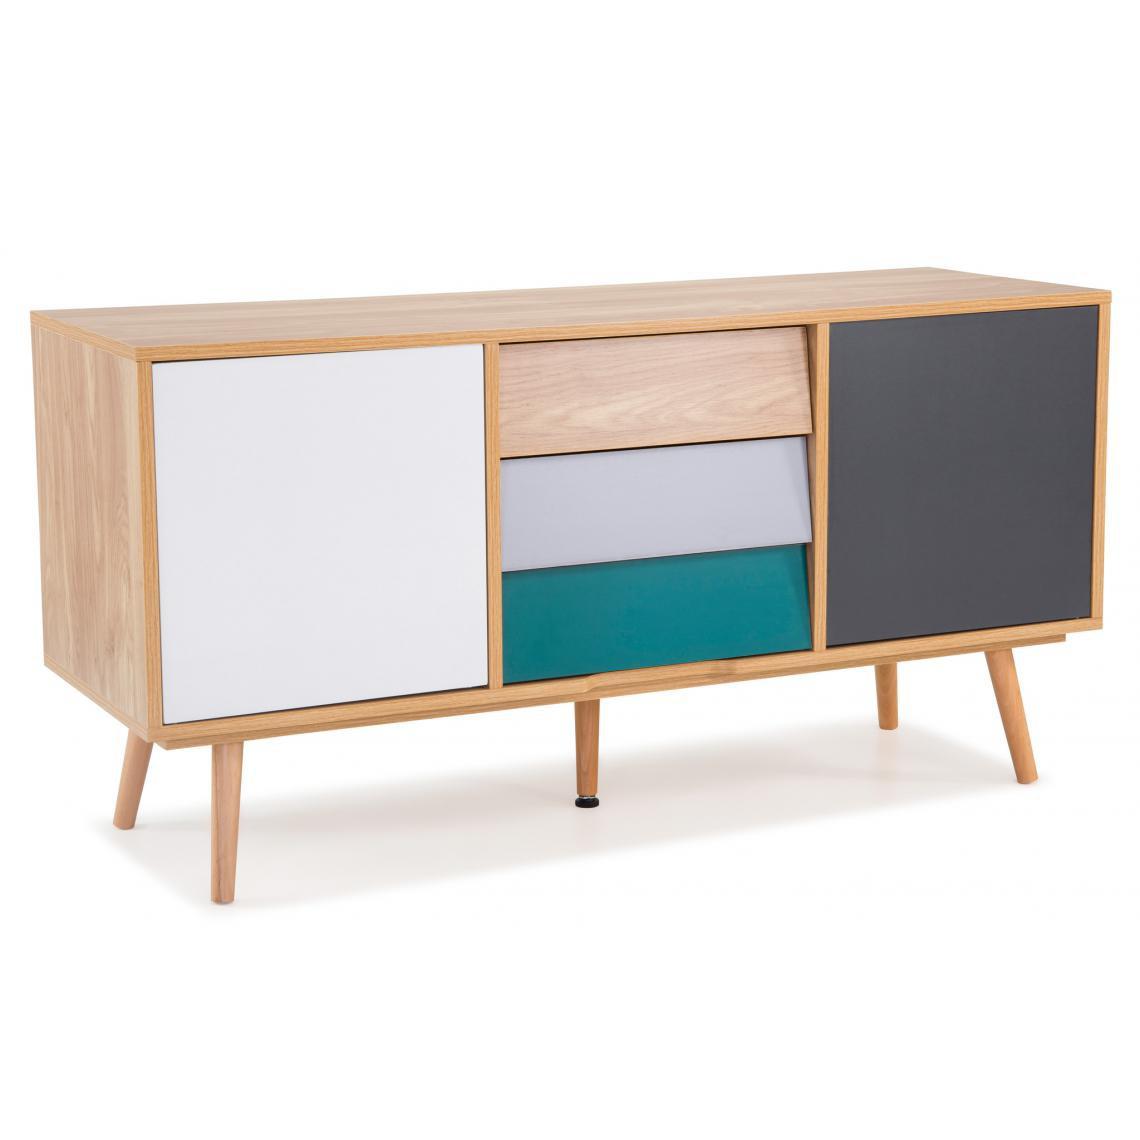 3S. x Home Meuble TV Pin Multicolore ALASKA